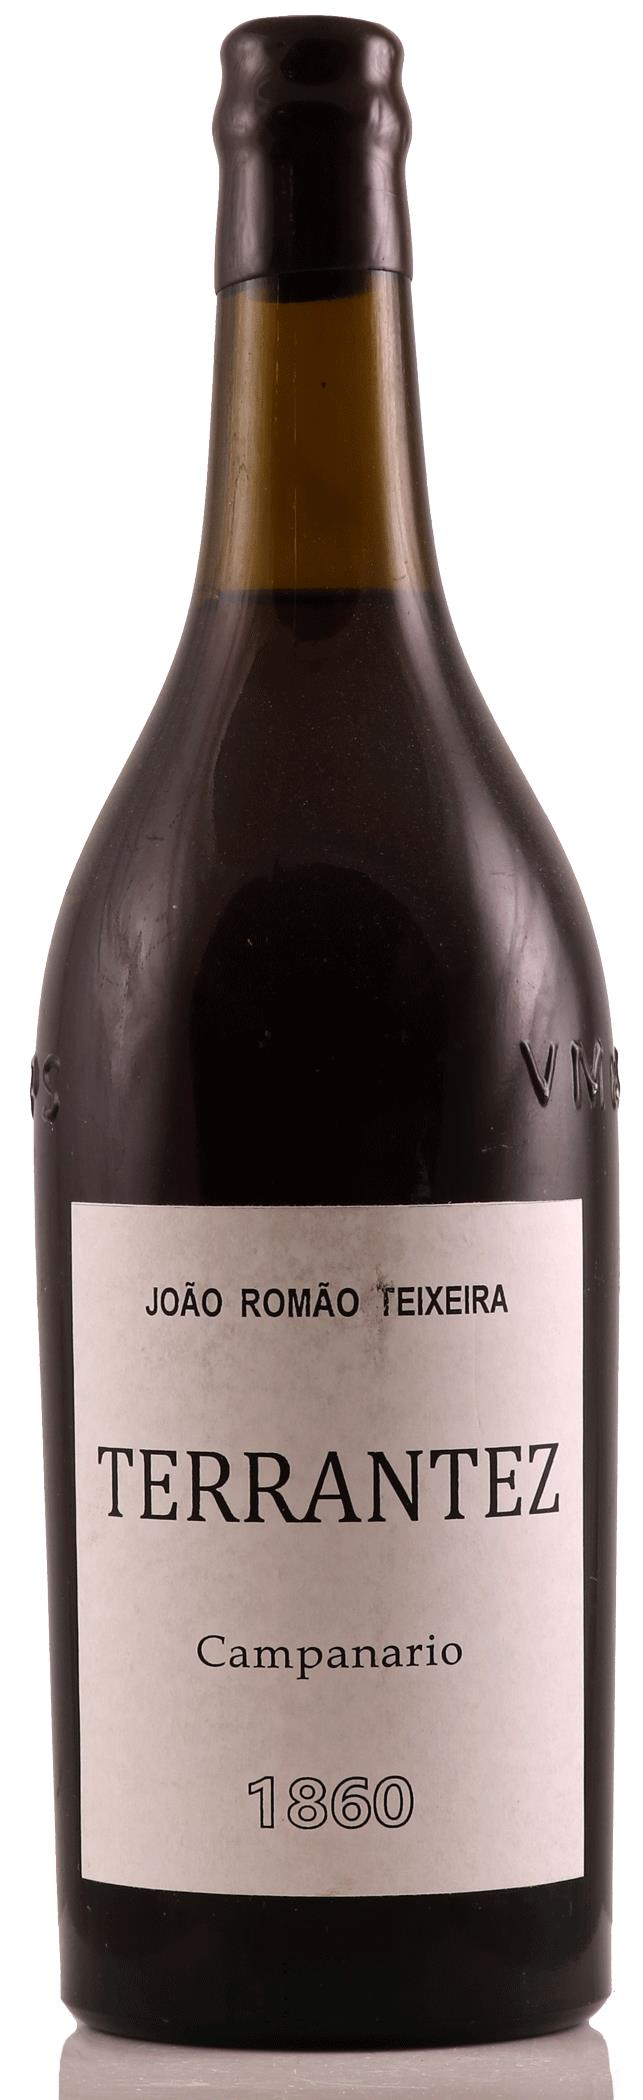 Madeira 1860 Teixeira, Joao Romao